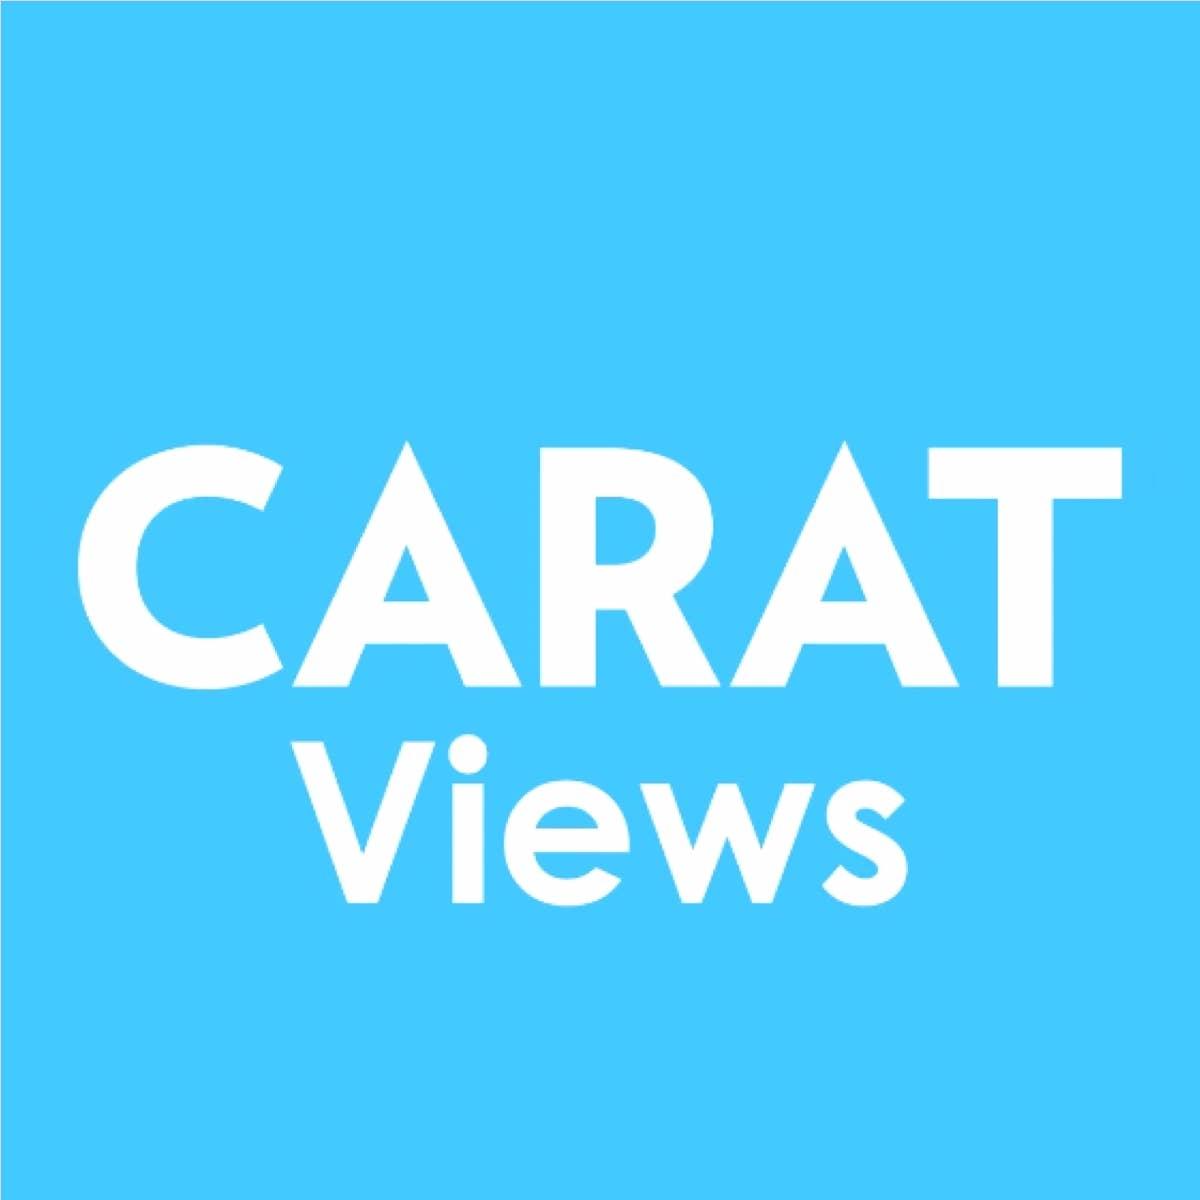 Carat Views: Virtual Holidays